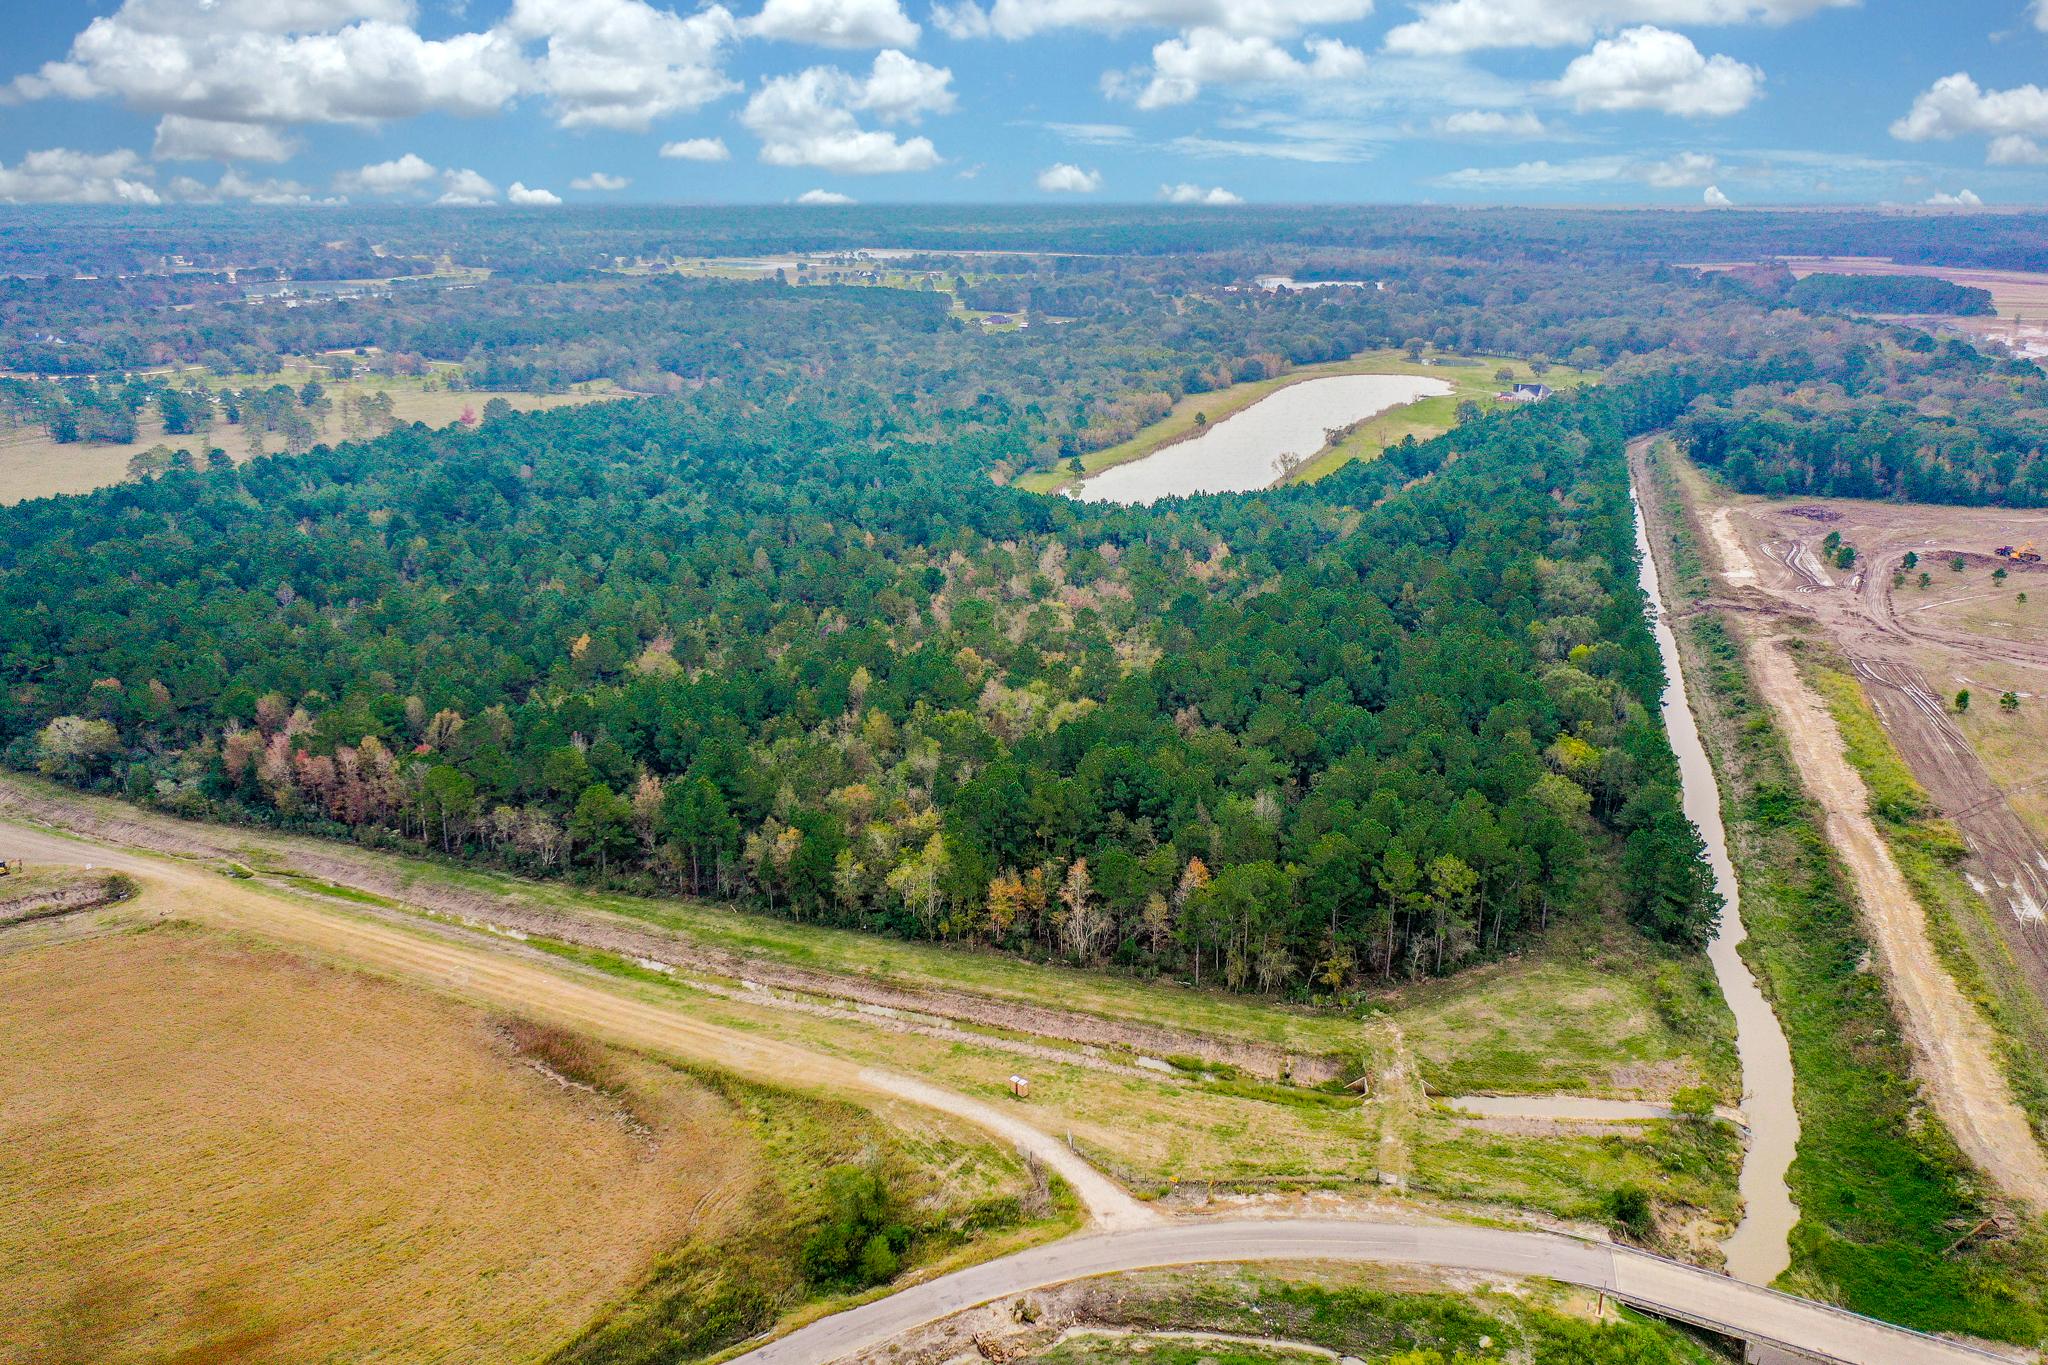 Jefferson County Development Land - Image 2 of 36